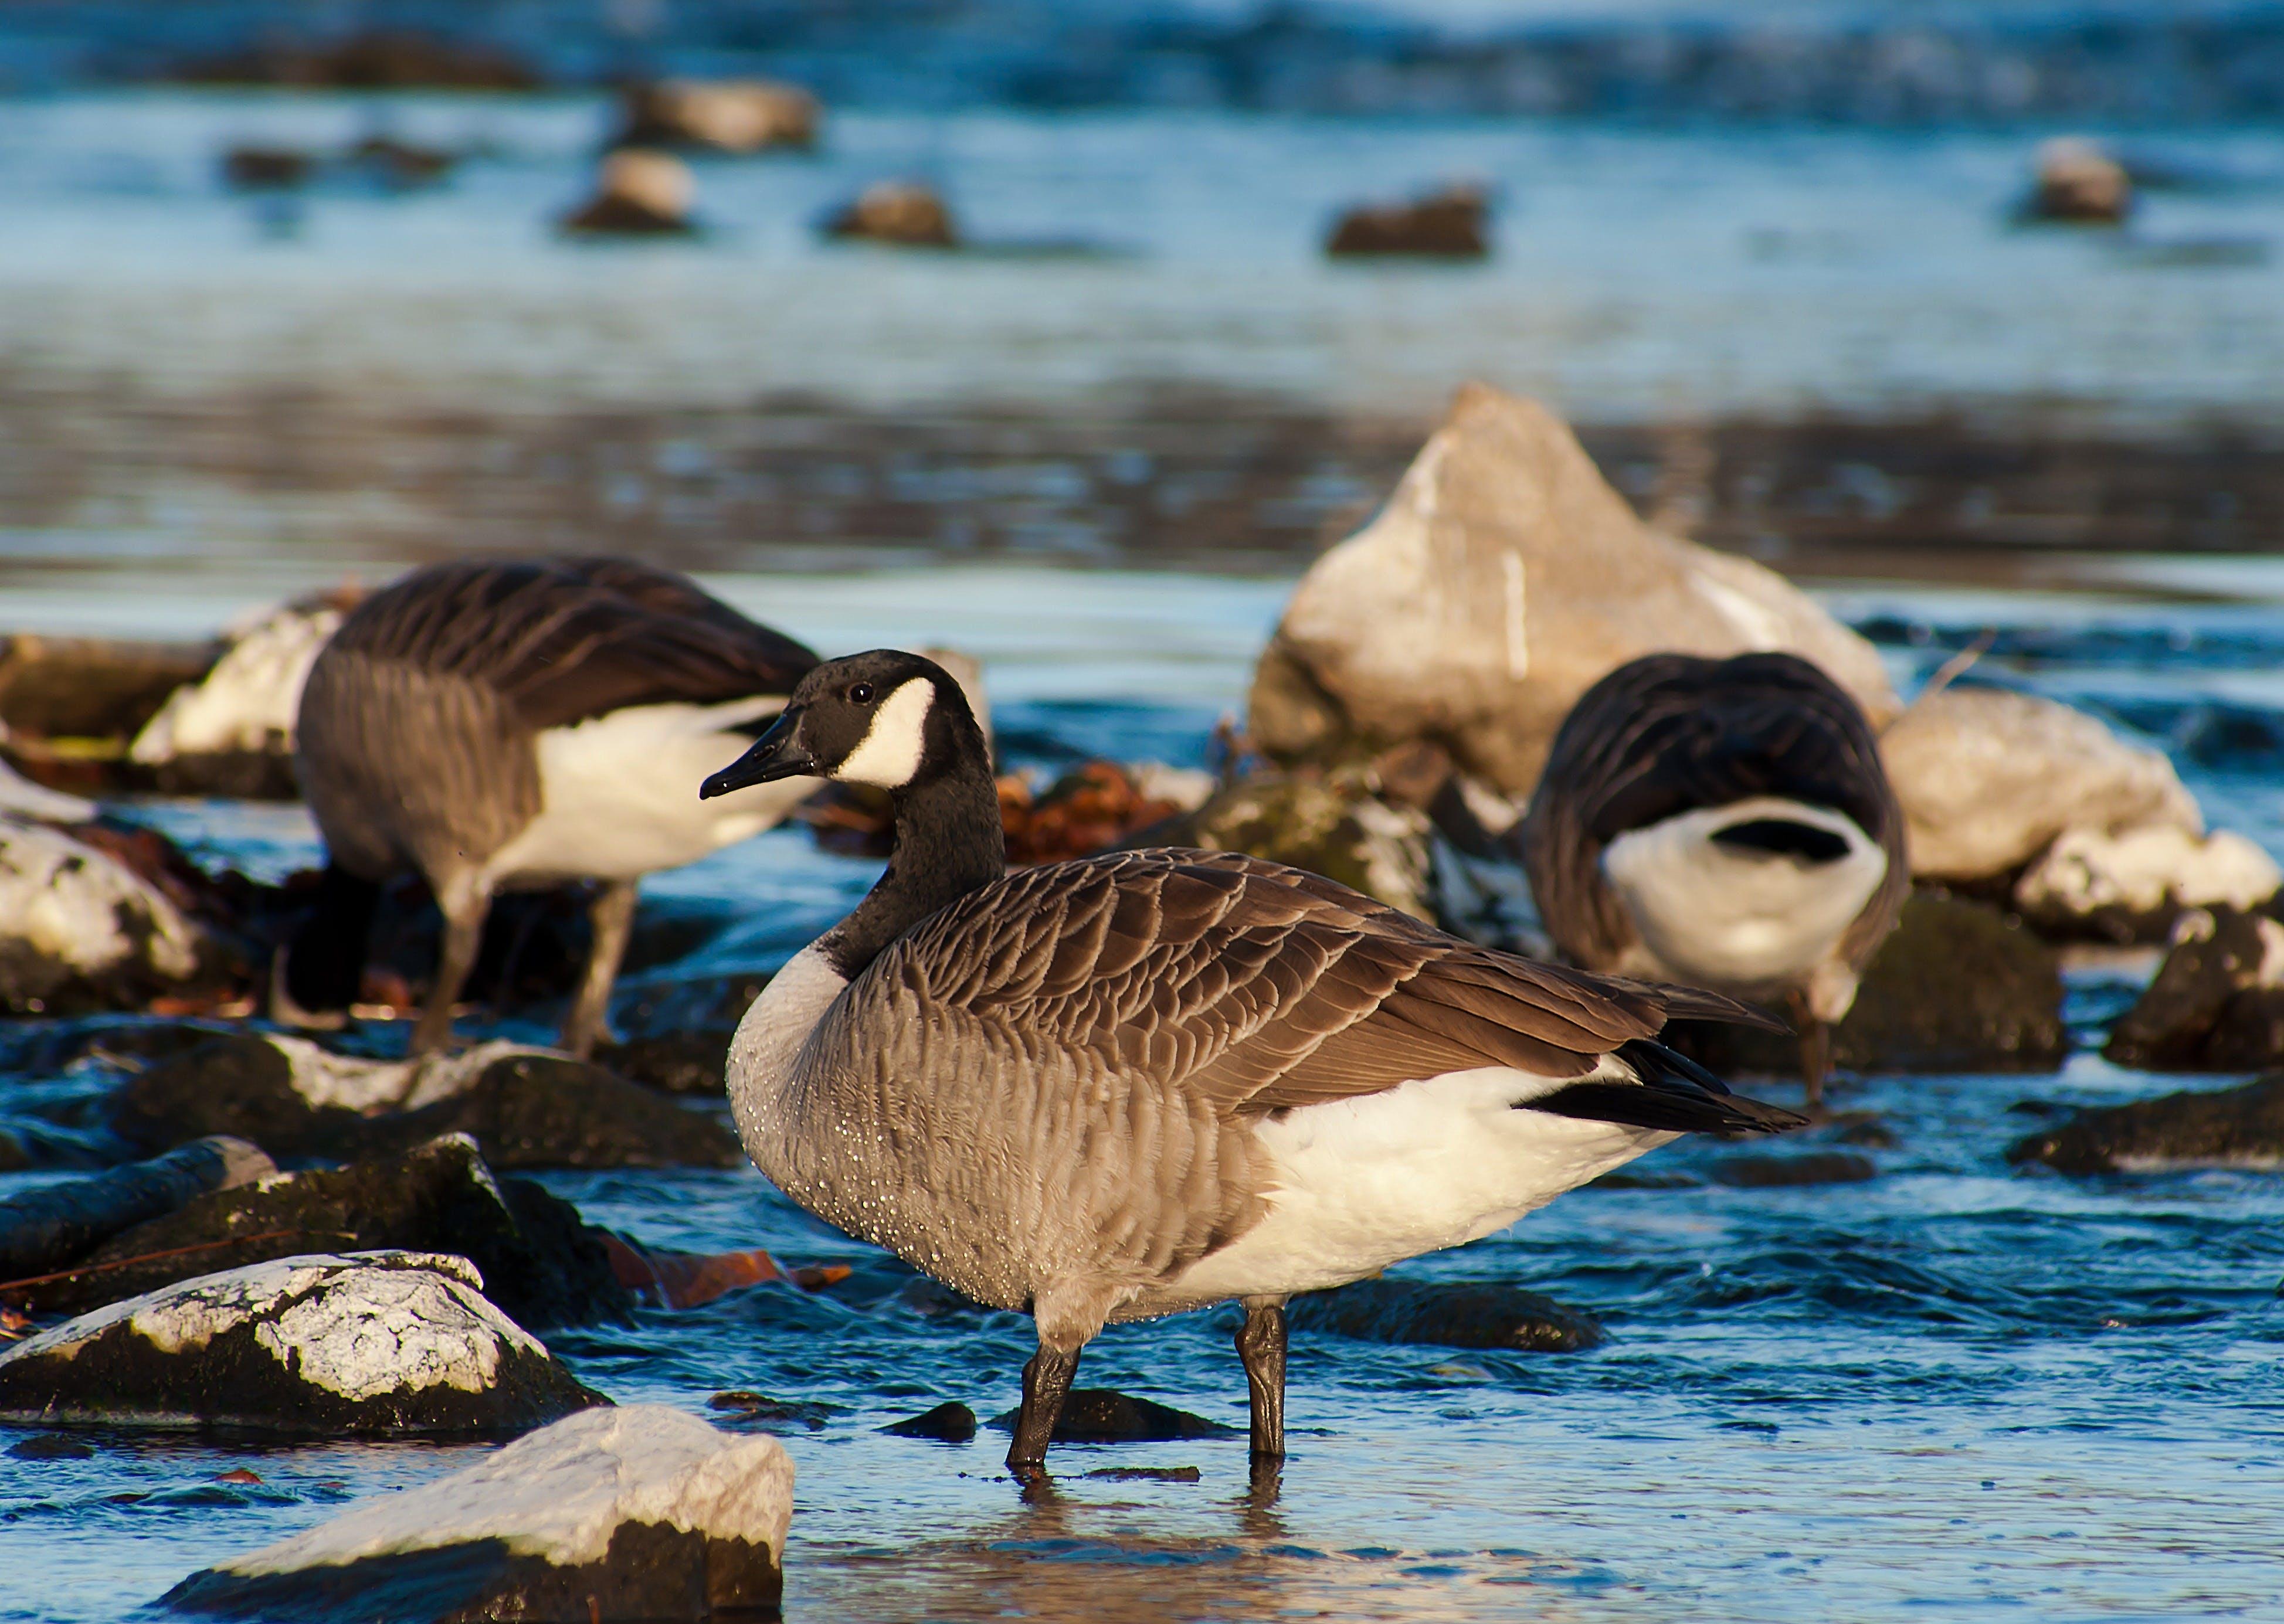 Mallard Ducks on Body of Water